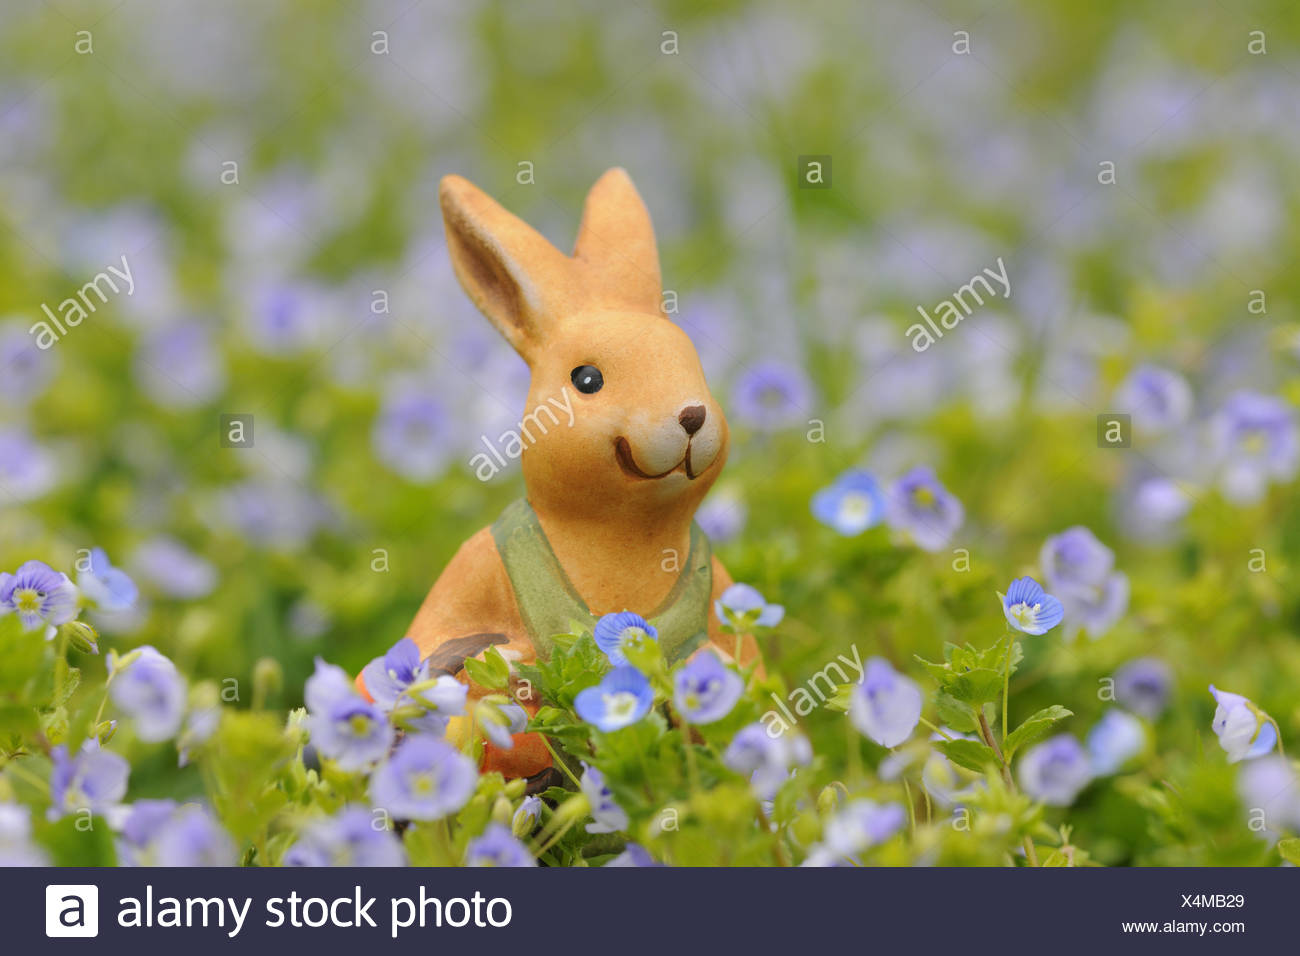 porcelain easter bunny meadow meadow flowers prize grass easter bunny hare porcelain easter spring feast character handicraft deko gartendeko tradition X4MB29